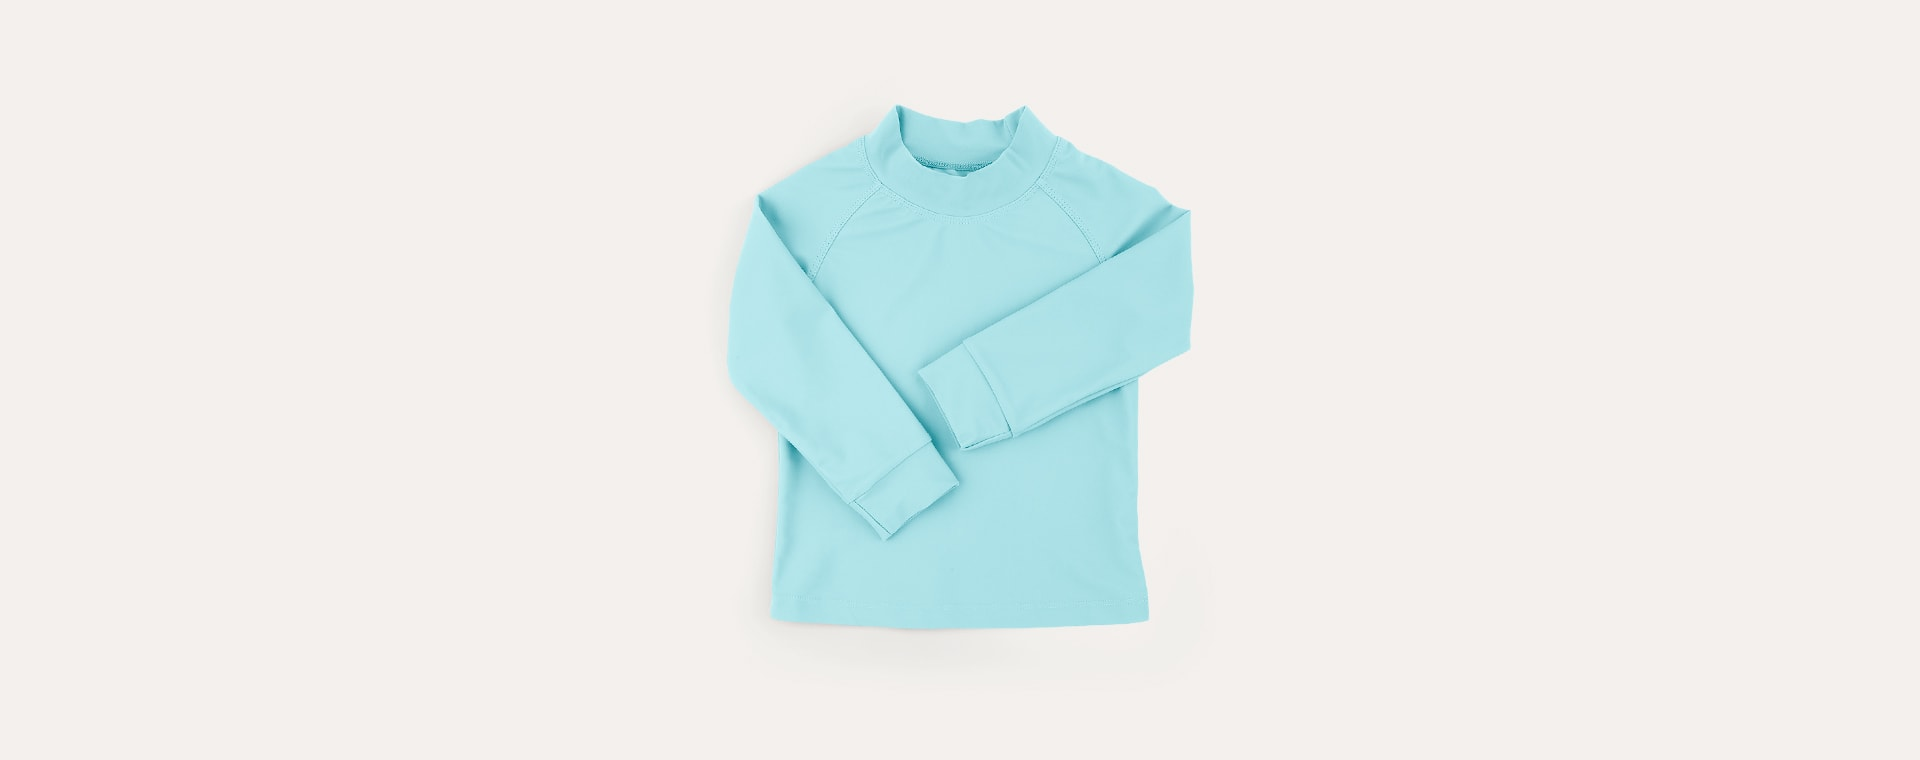 Aqua KIDLY Label Recycled Rash Vest